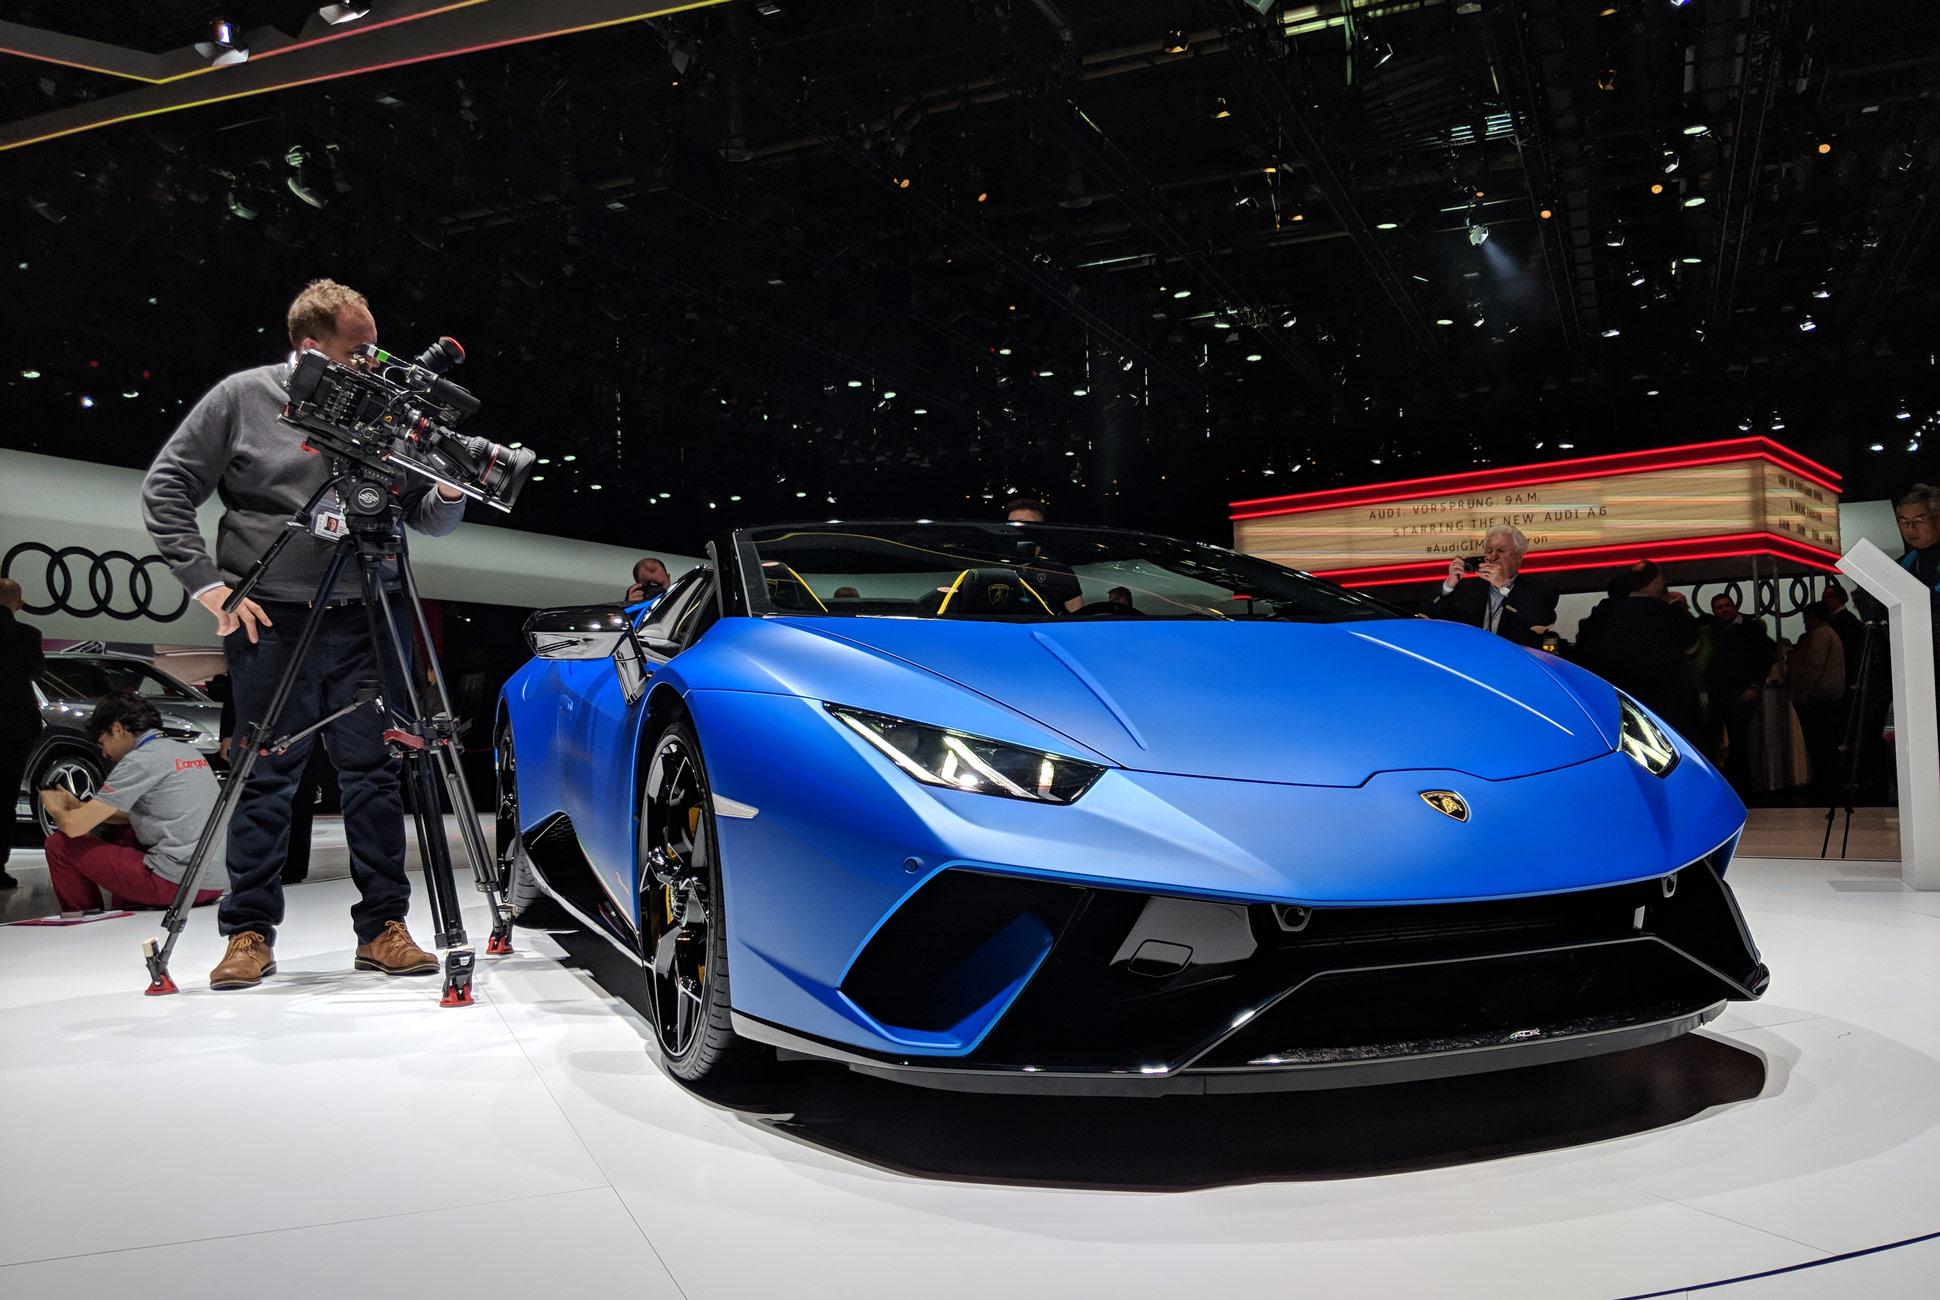 Best Cars of the 2018 Geneva Motor Show • Gear Patrol